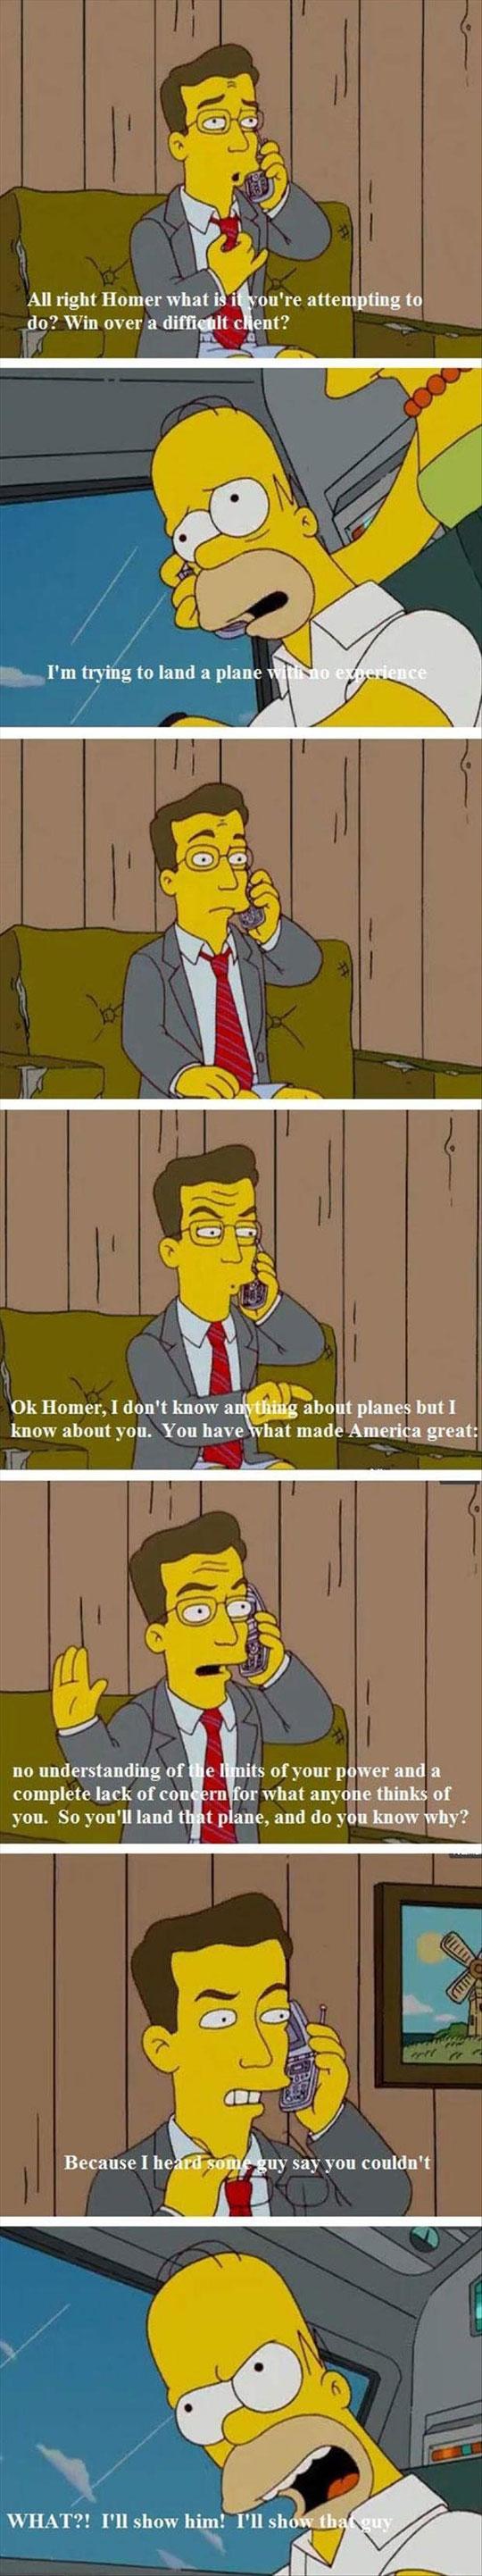 funny-Homer-Simpsons-plane-phone-help